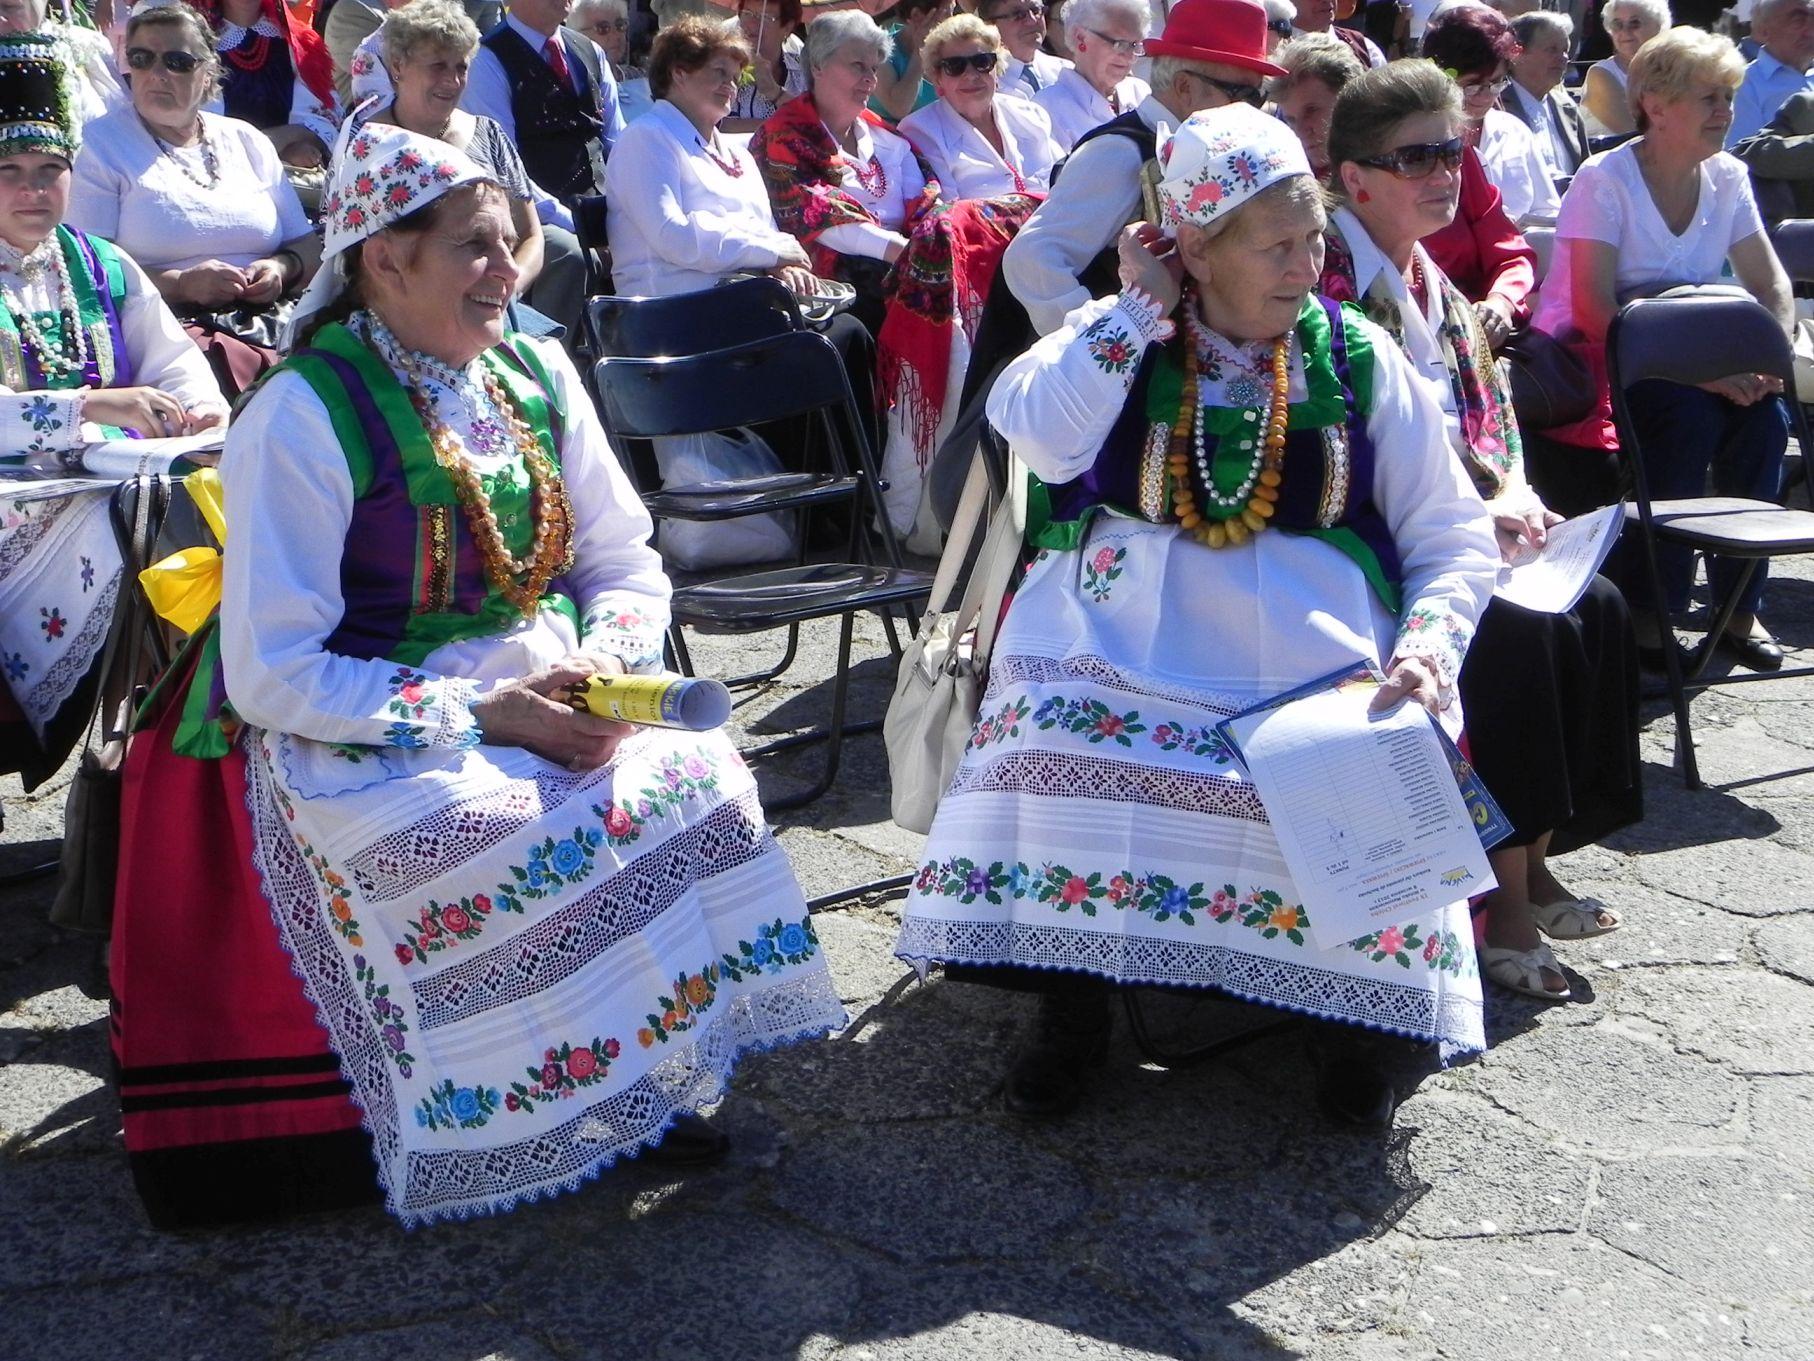 2013-09-10 Festyn - Mińsk Maz (28)